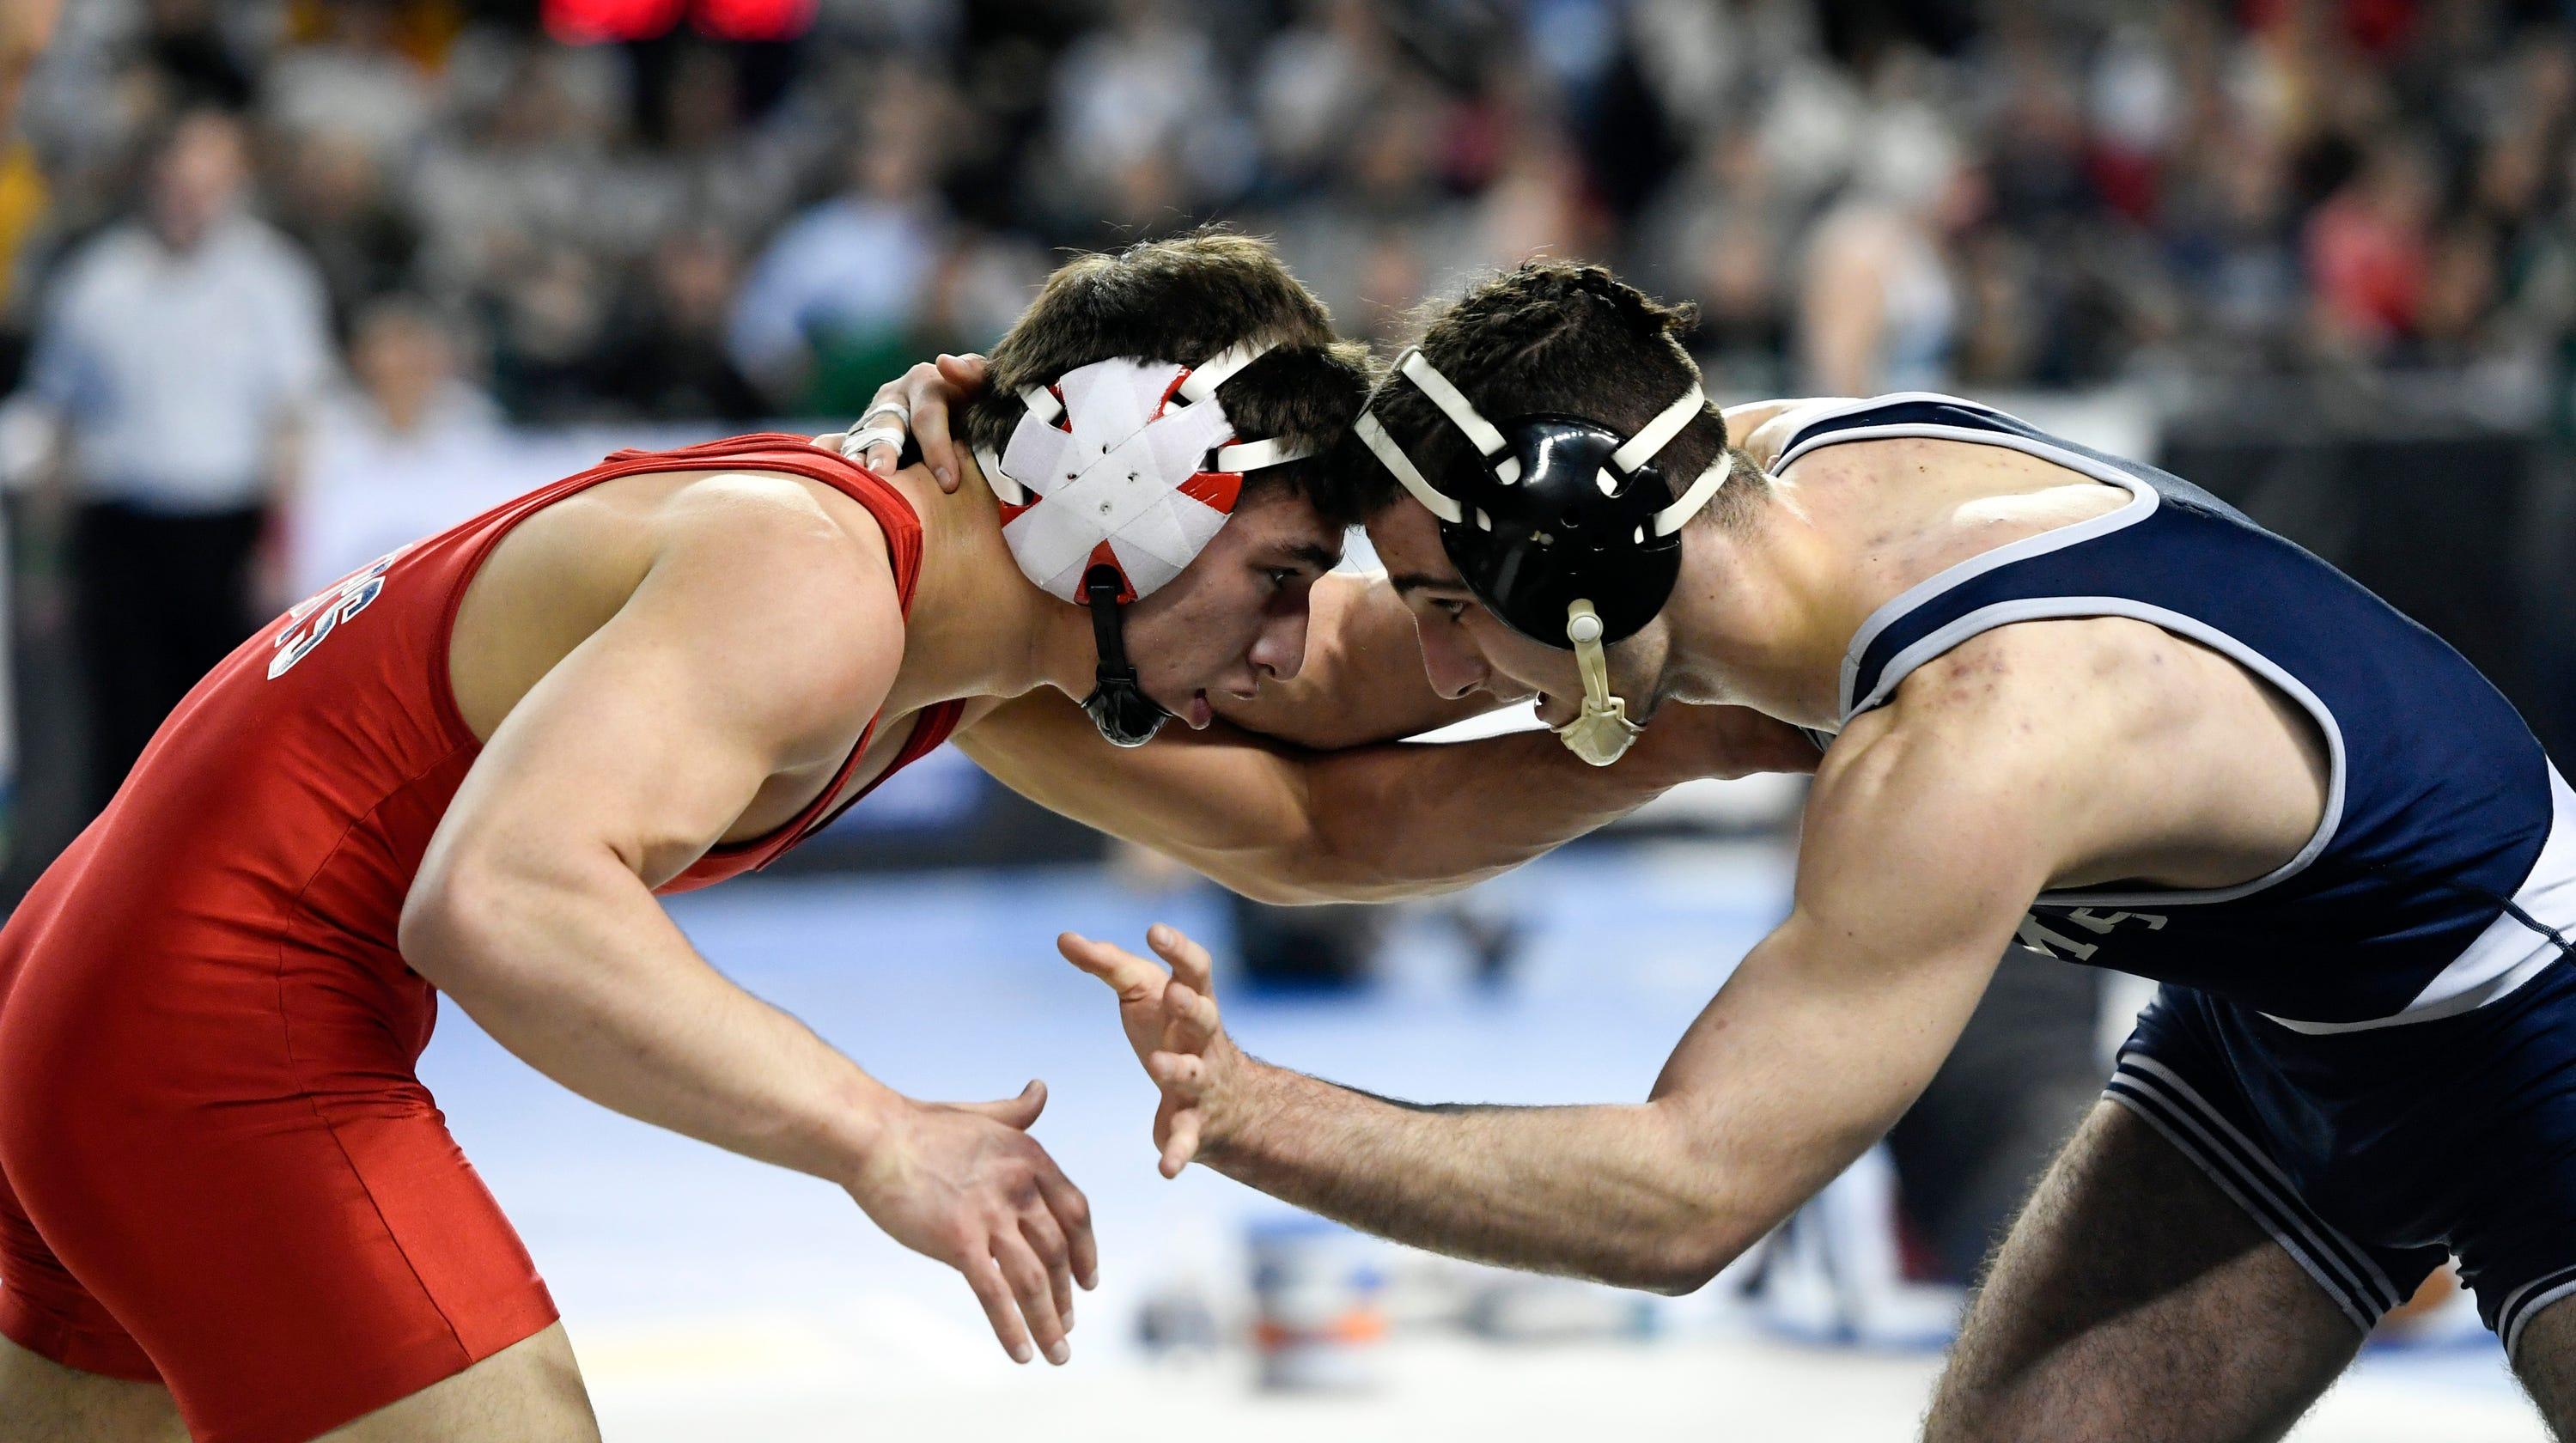 Tony Asatrian, wrestler in Bergen Catholic lawsuit, places third